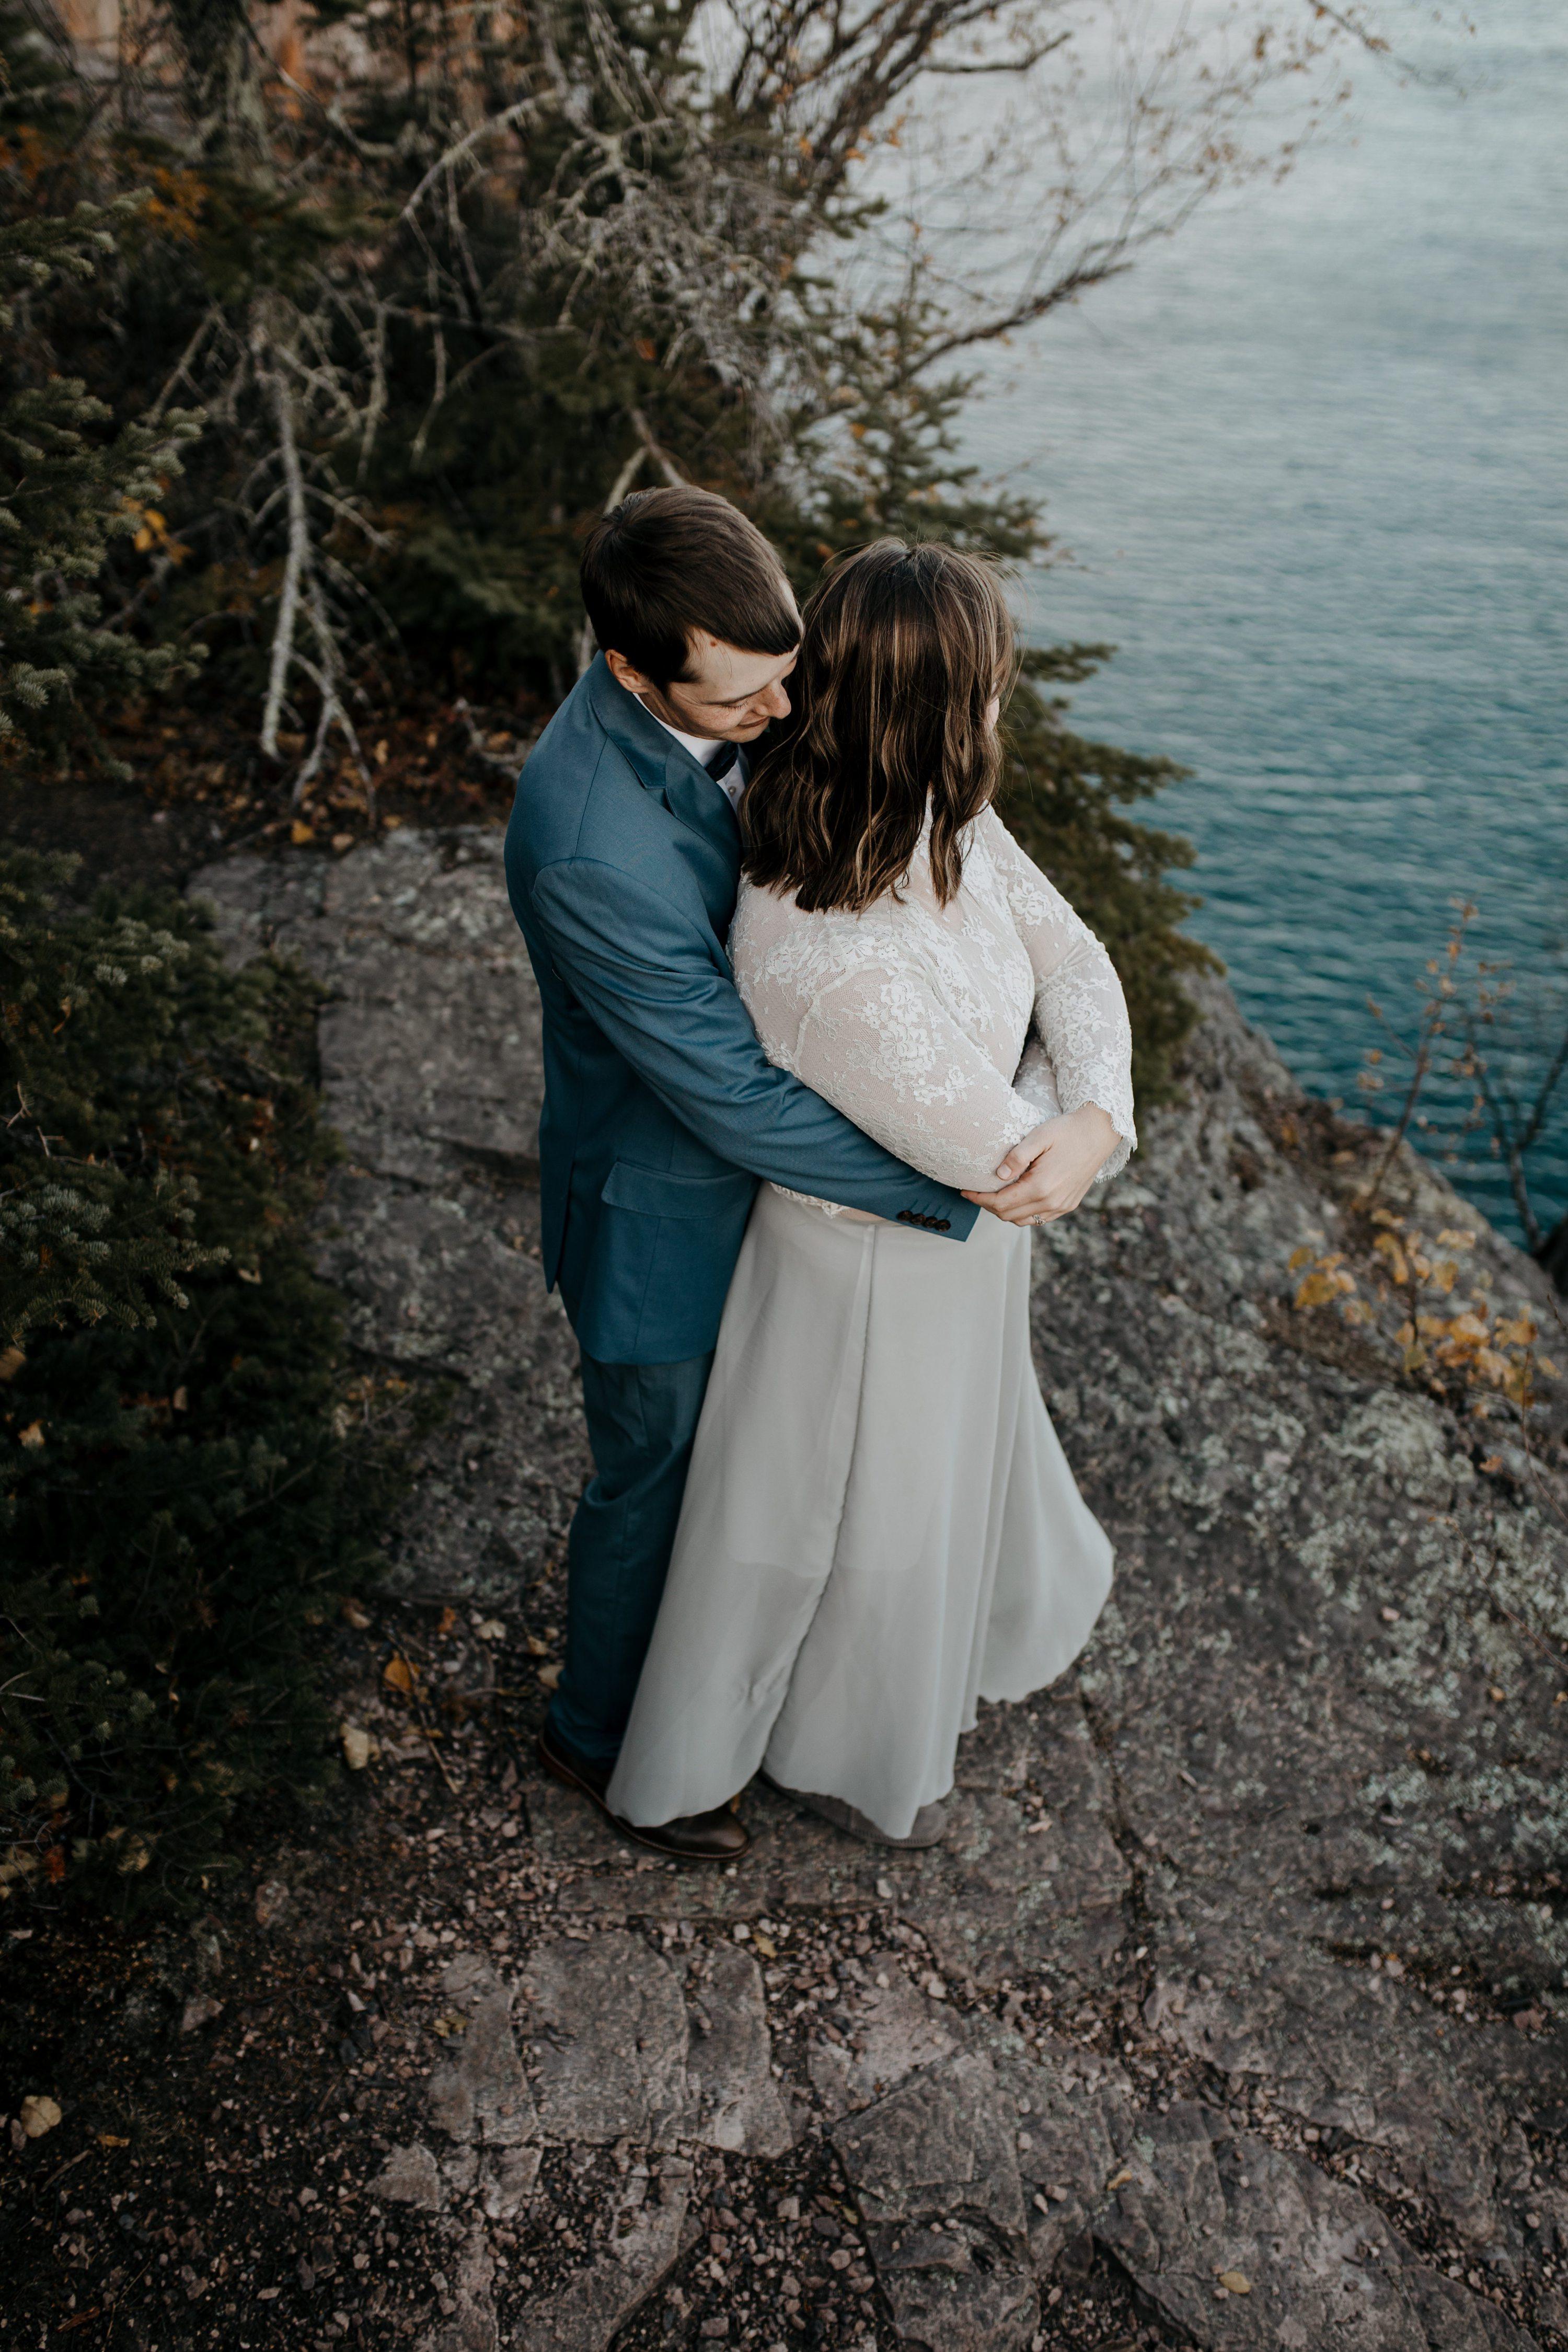 outdoor elopement,fall elopement,north shore mn elopement,palisade head elopement